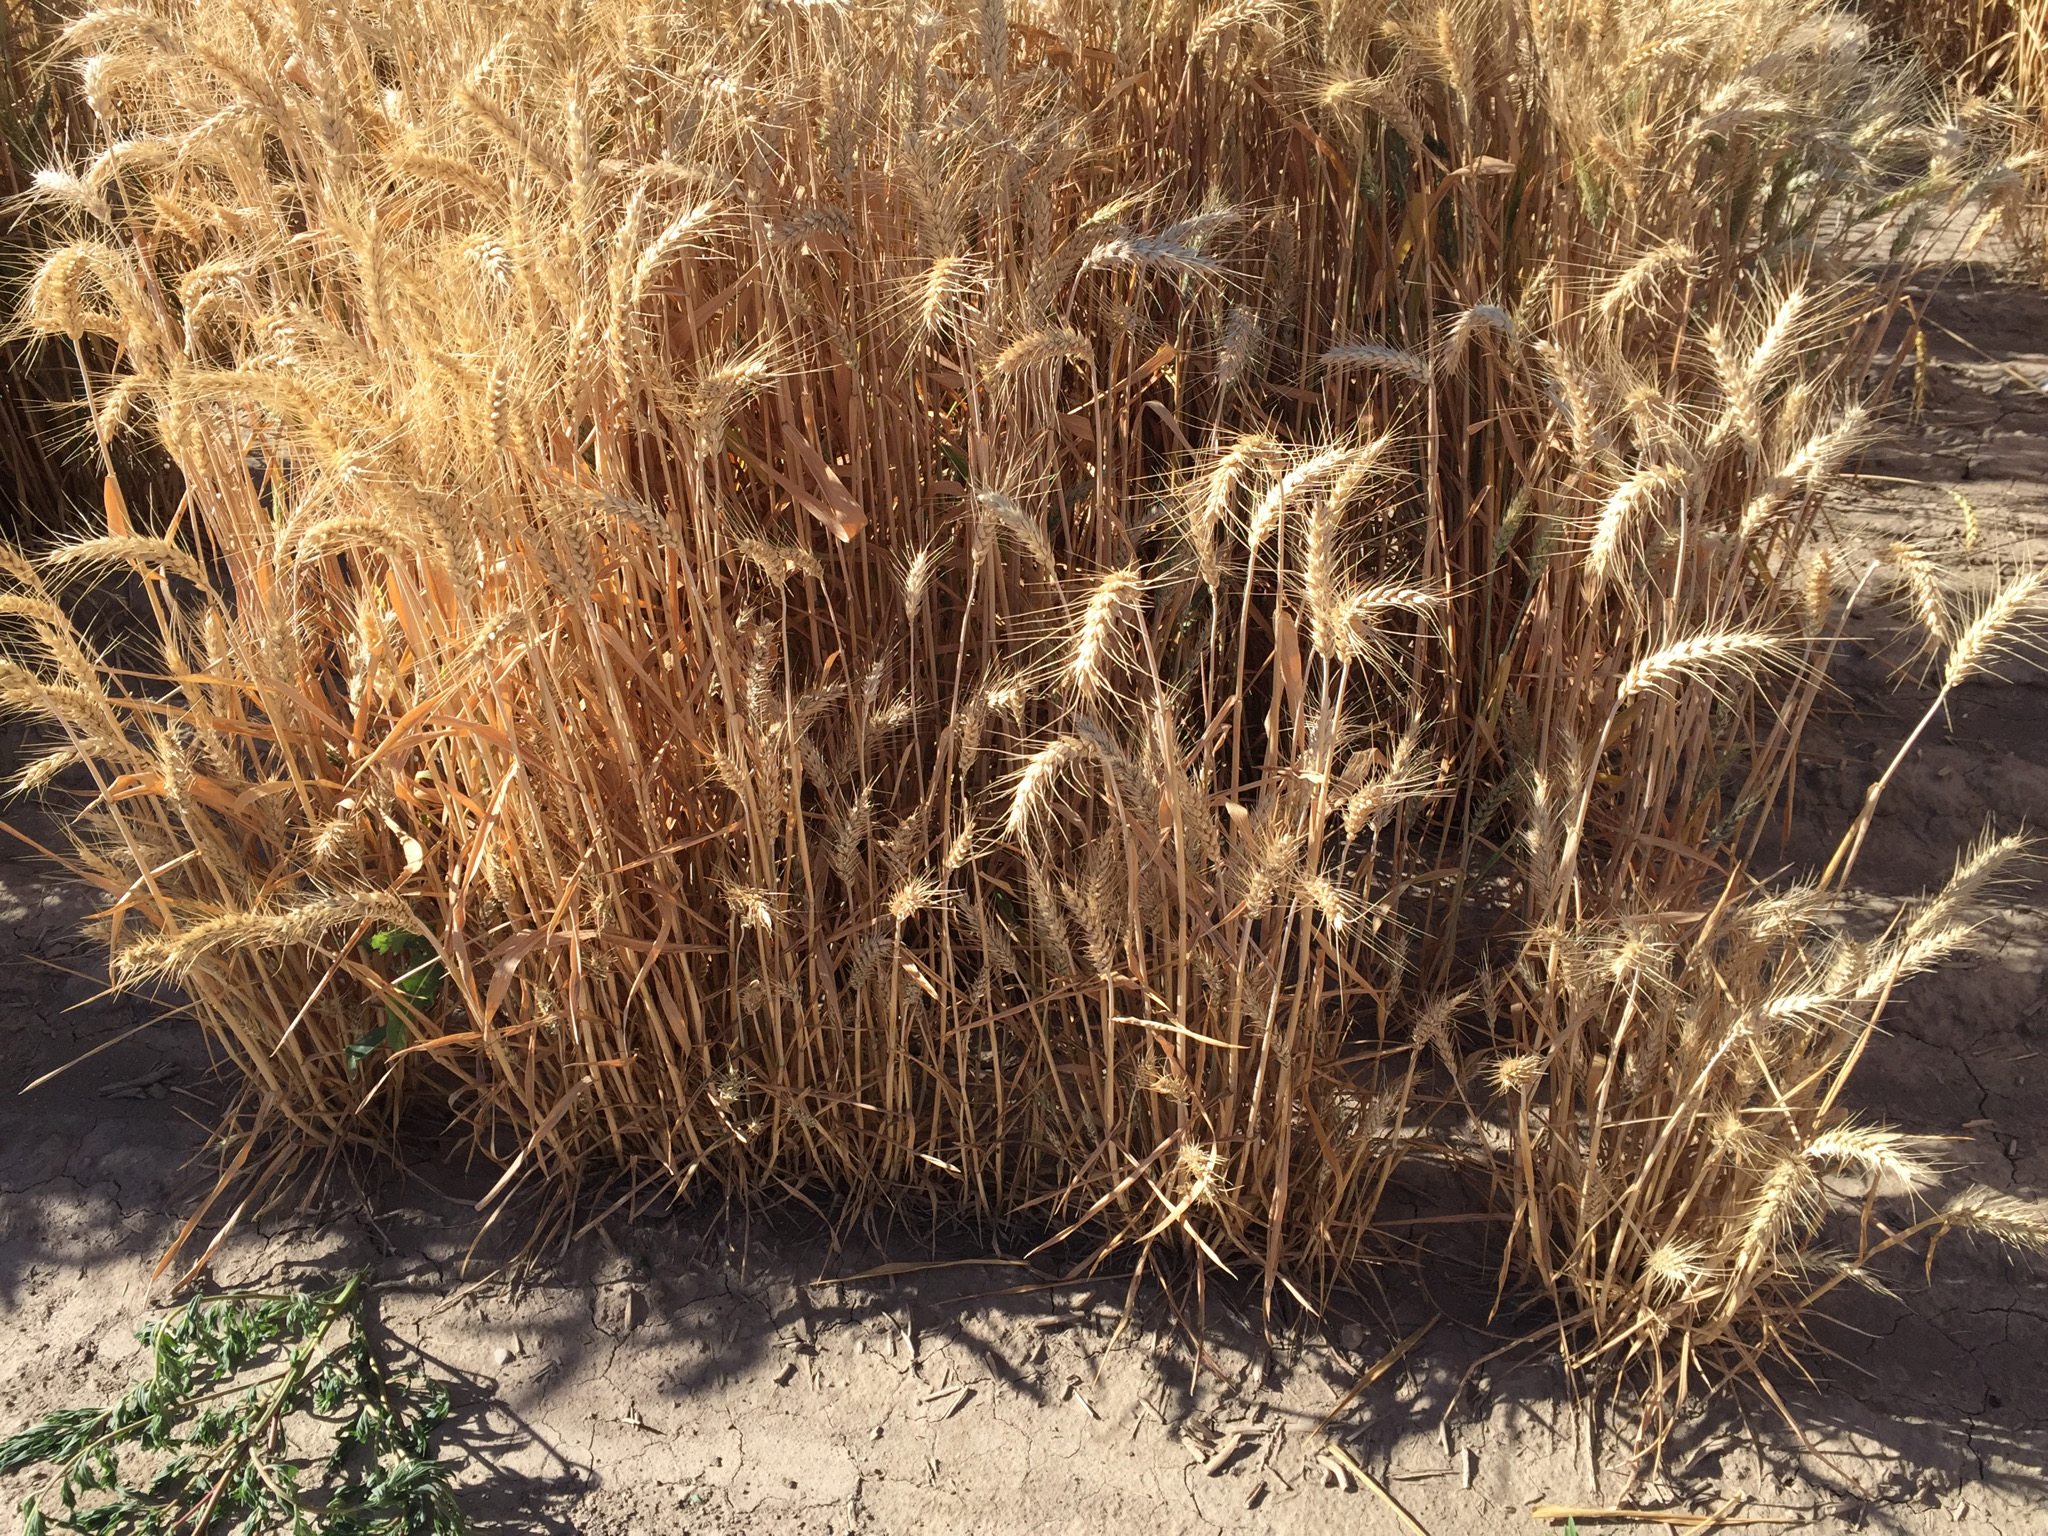 Wheat plant stunting symptomatic of dwarf bunt.